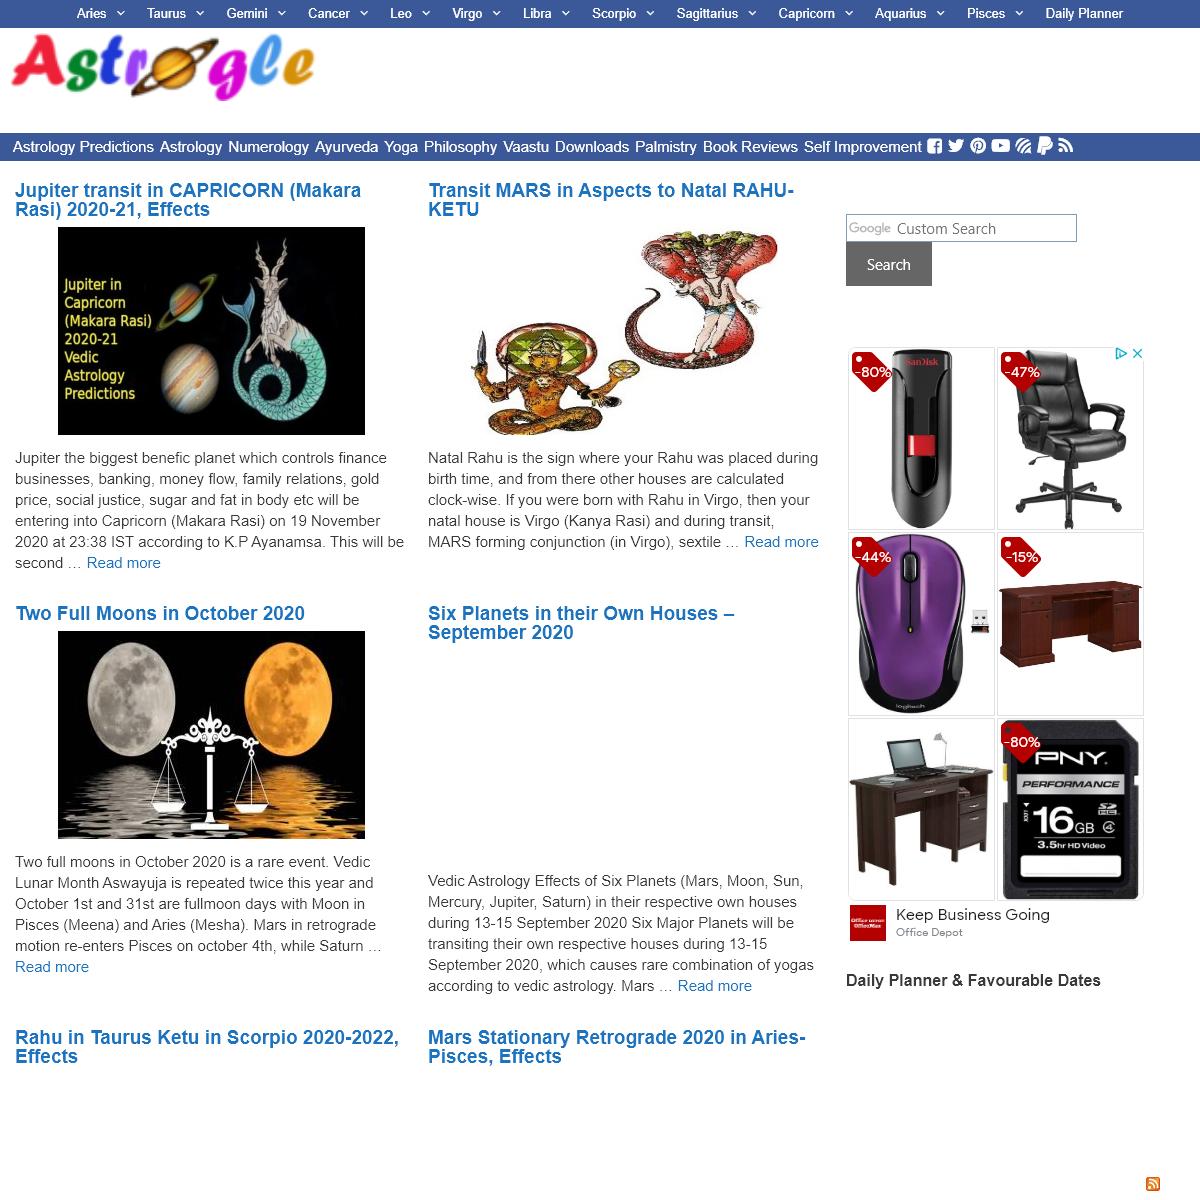 Vedic Astrology & Ayurveda - Yoga, Vaastu, Numerology, Self Improvement etc